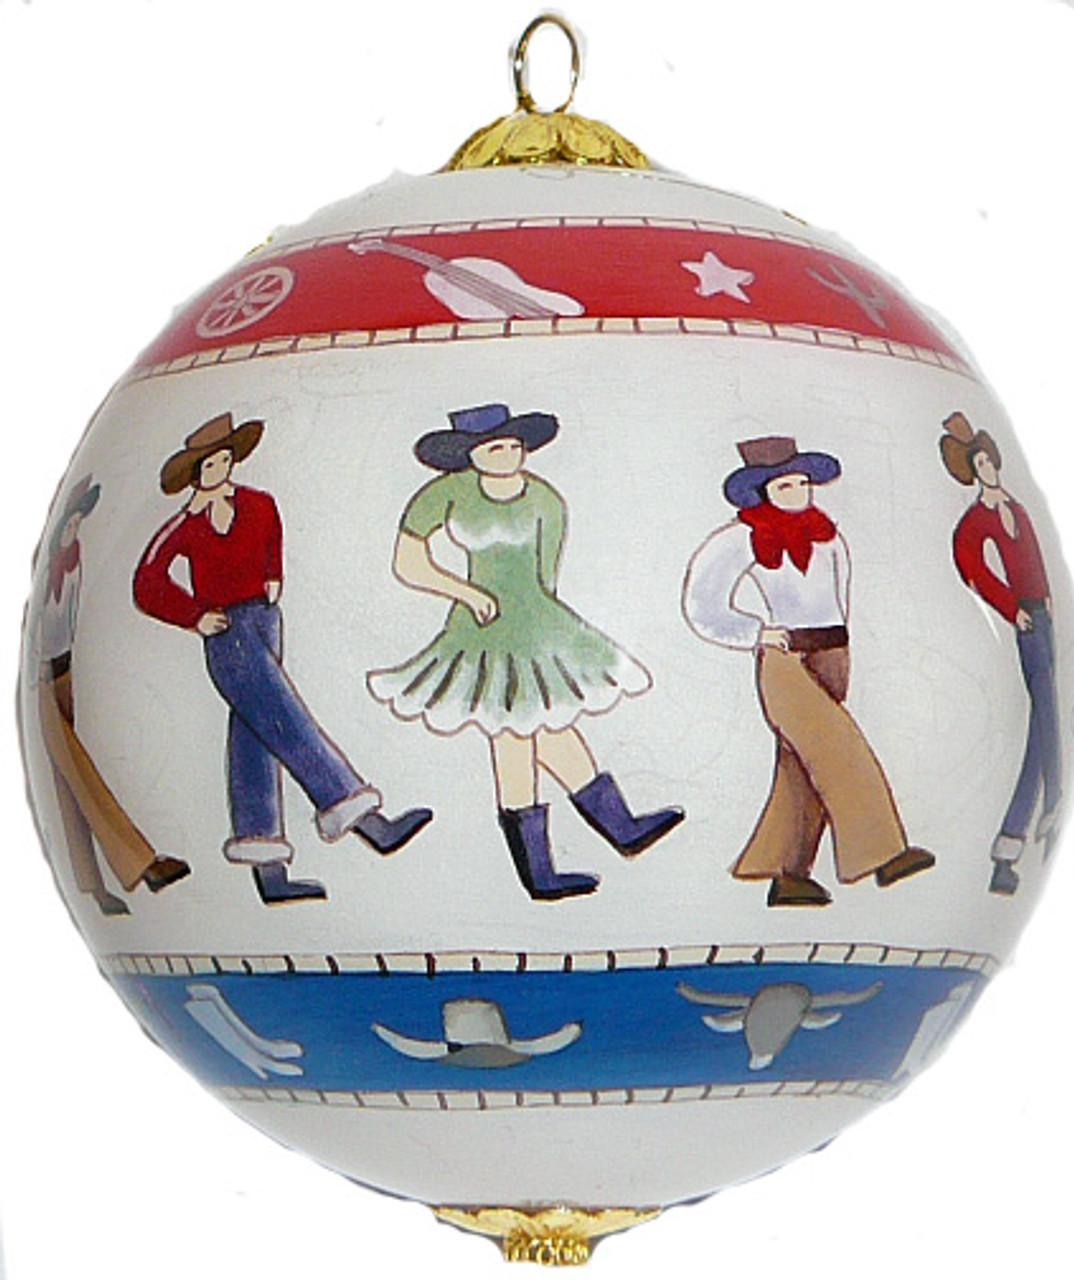 "Line dancers - 3"" Ornament Set of 2"